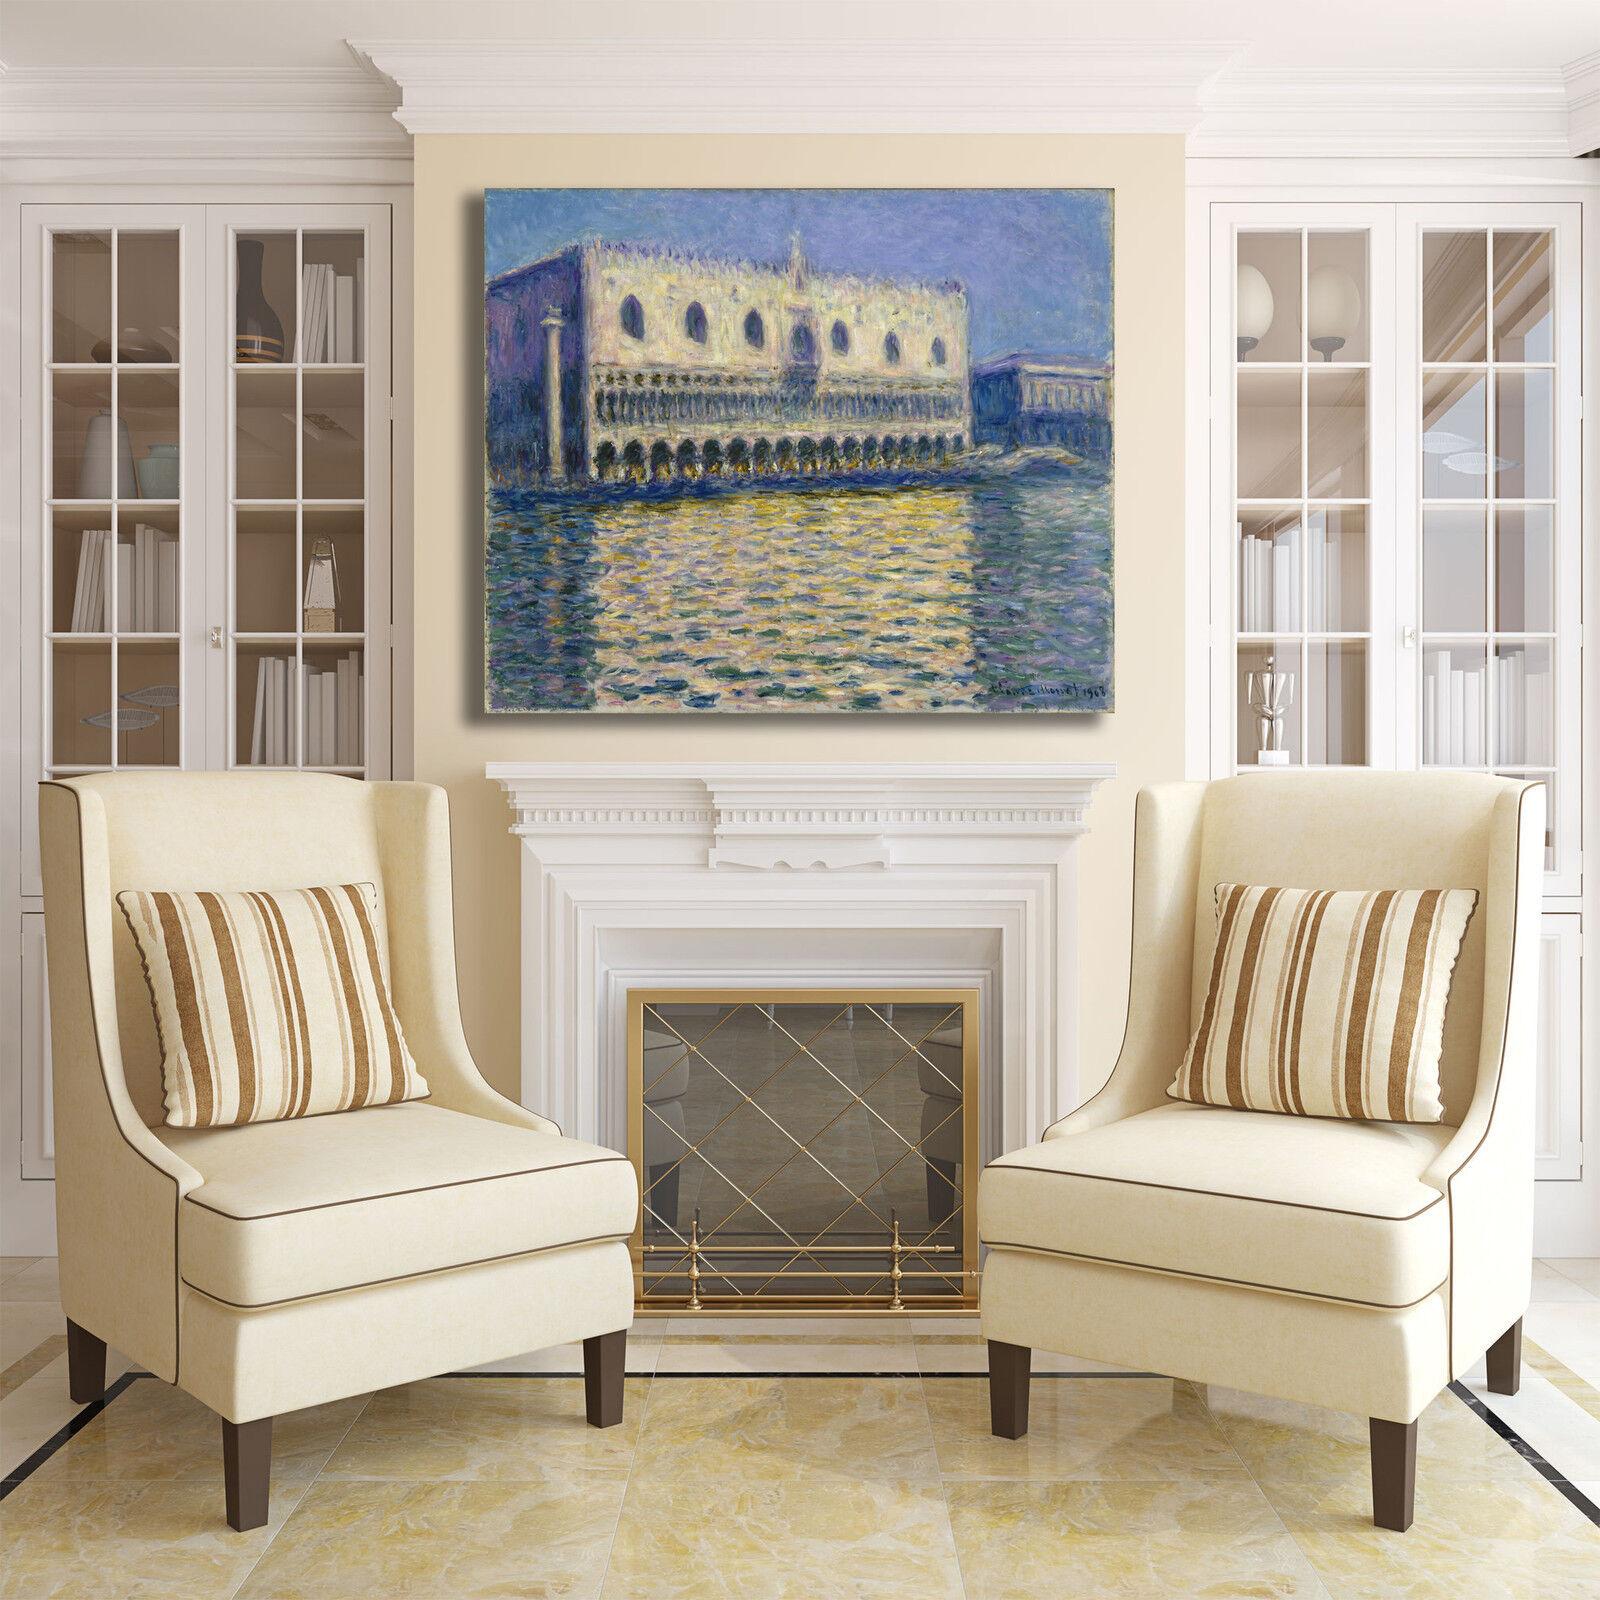 Monet il palazzo ducale design casa quadro stampa tela dipinto telaio arRouge o casa design c51c0b